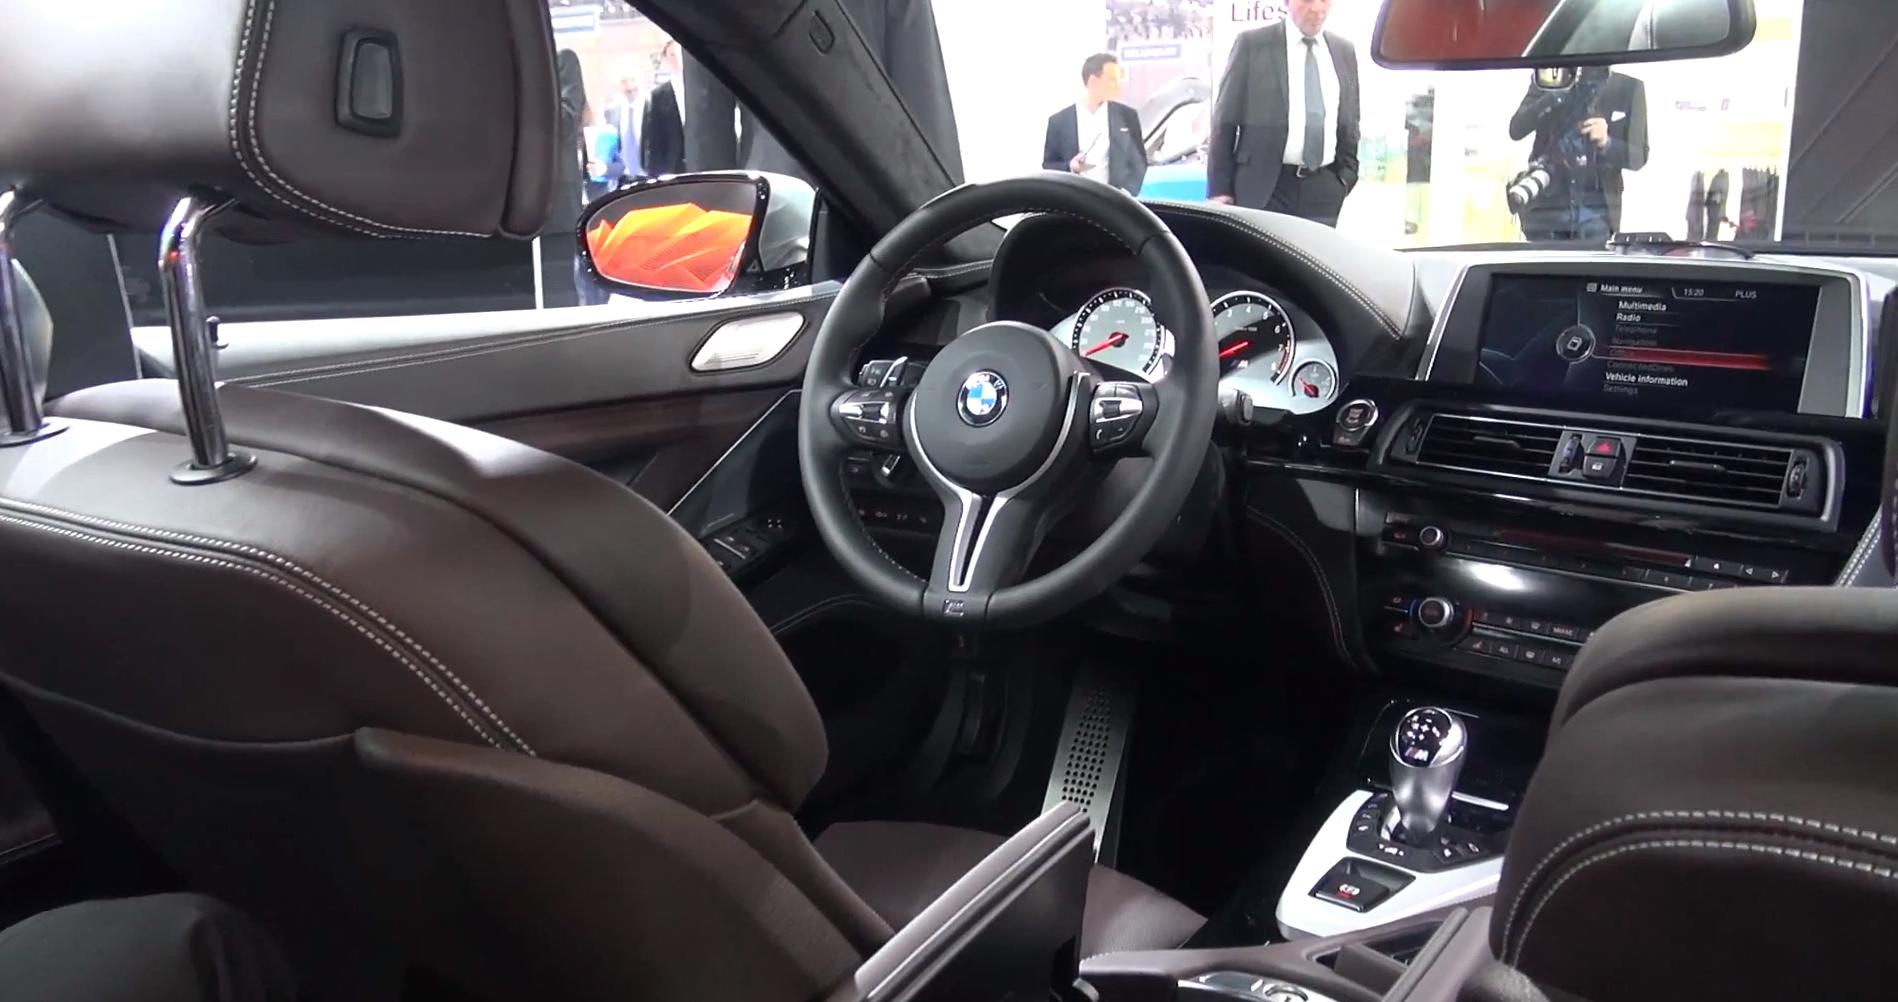 The bmw f06 m6 gran coupe interior showcased at geneva - Bmw m6 gran coupe interior ...